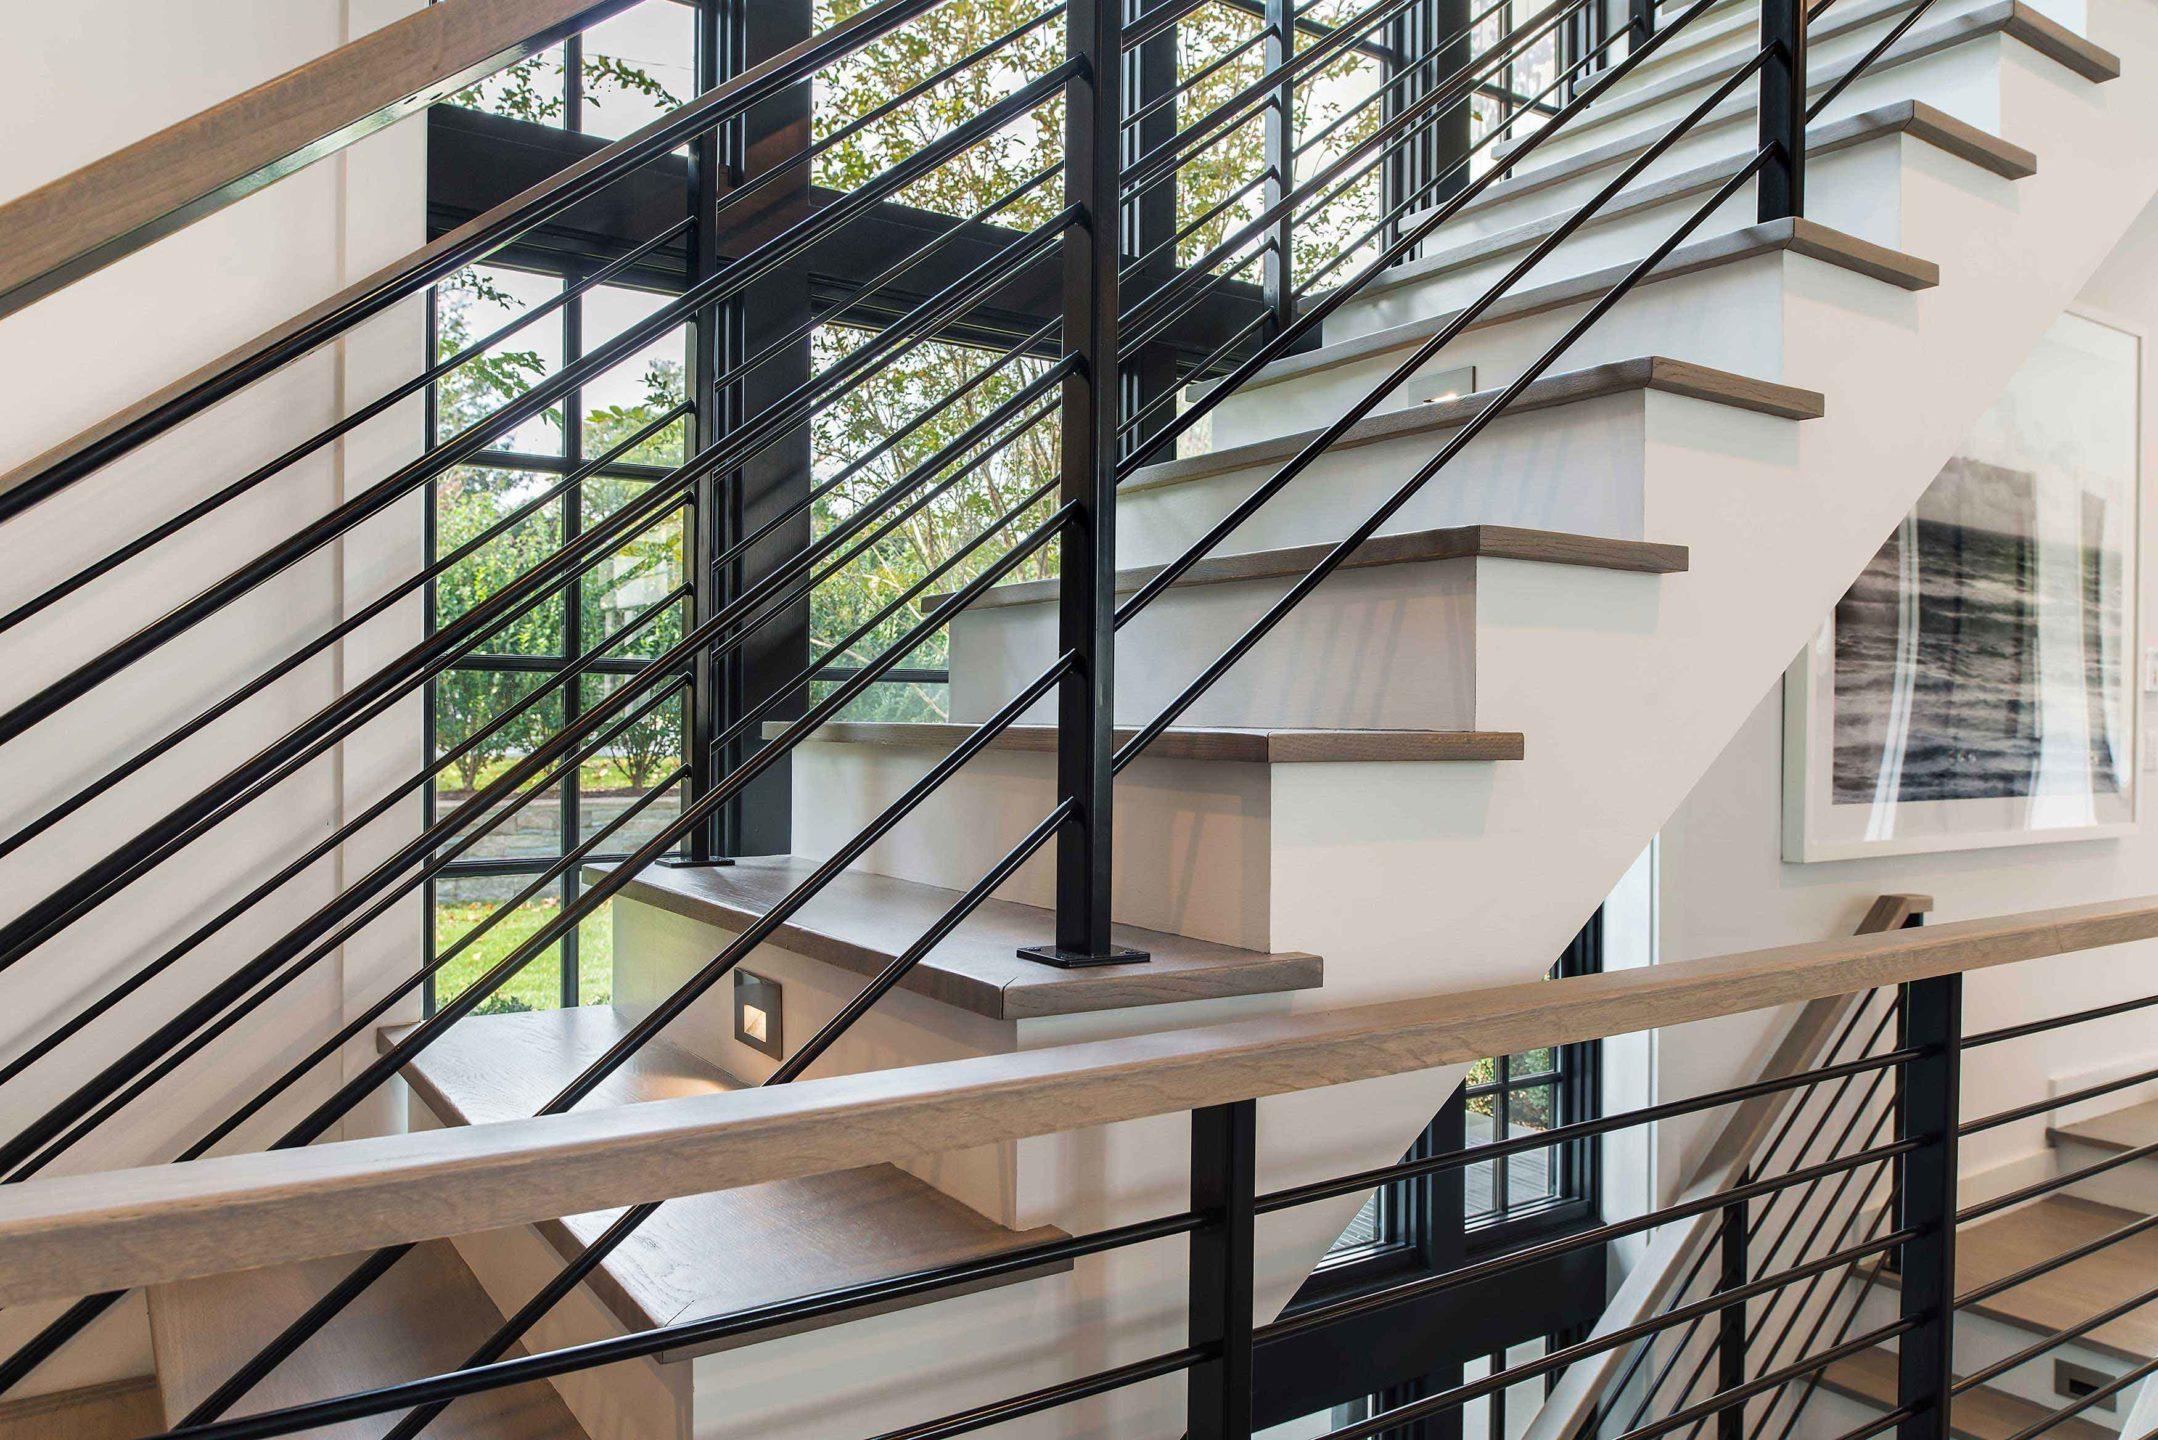 Nicole-Fuller-Interiors-East-Hampton-Beach-House-neutral-Bohemian-interior-design-modern-stairs